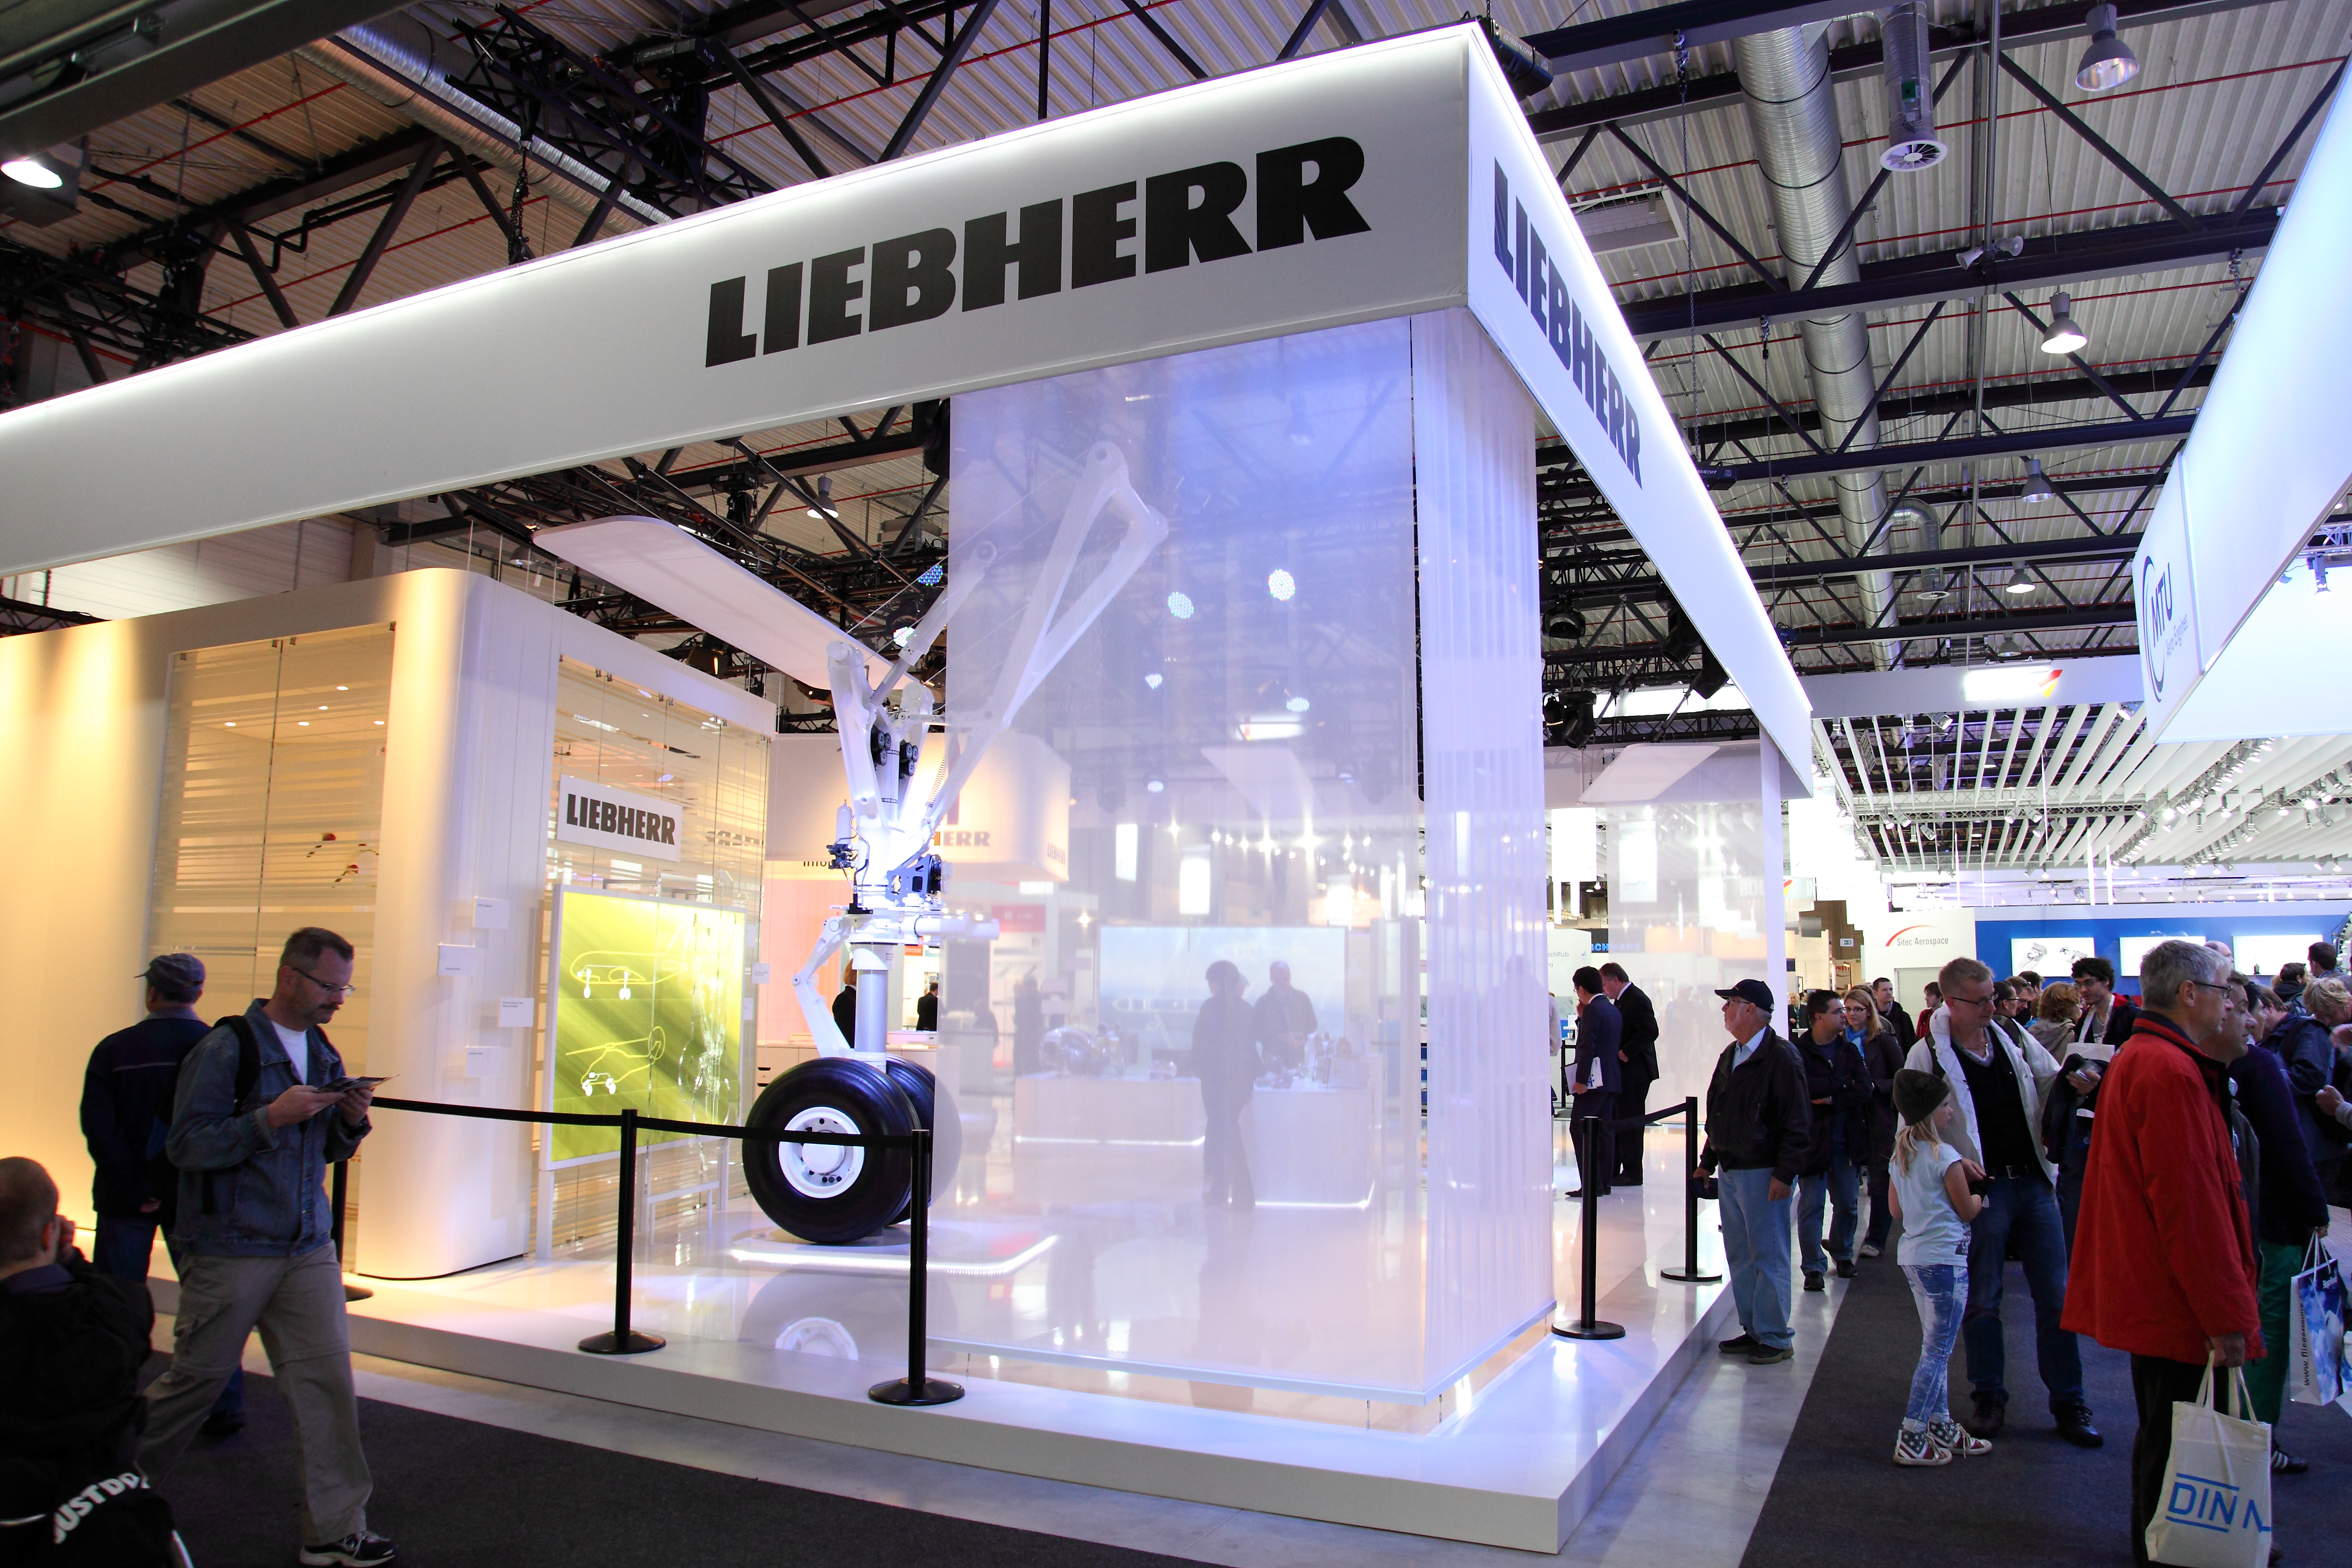 Liebherr Aerospace - Wikipedia